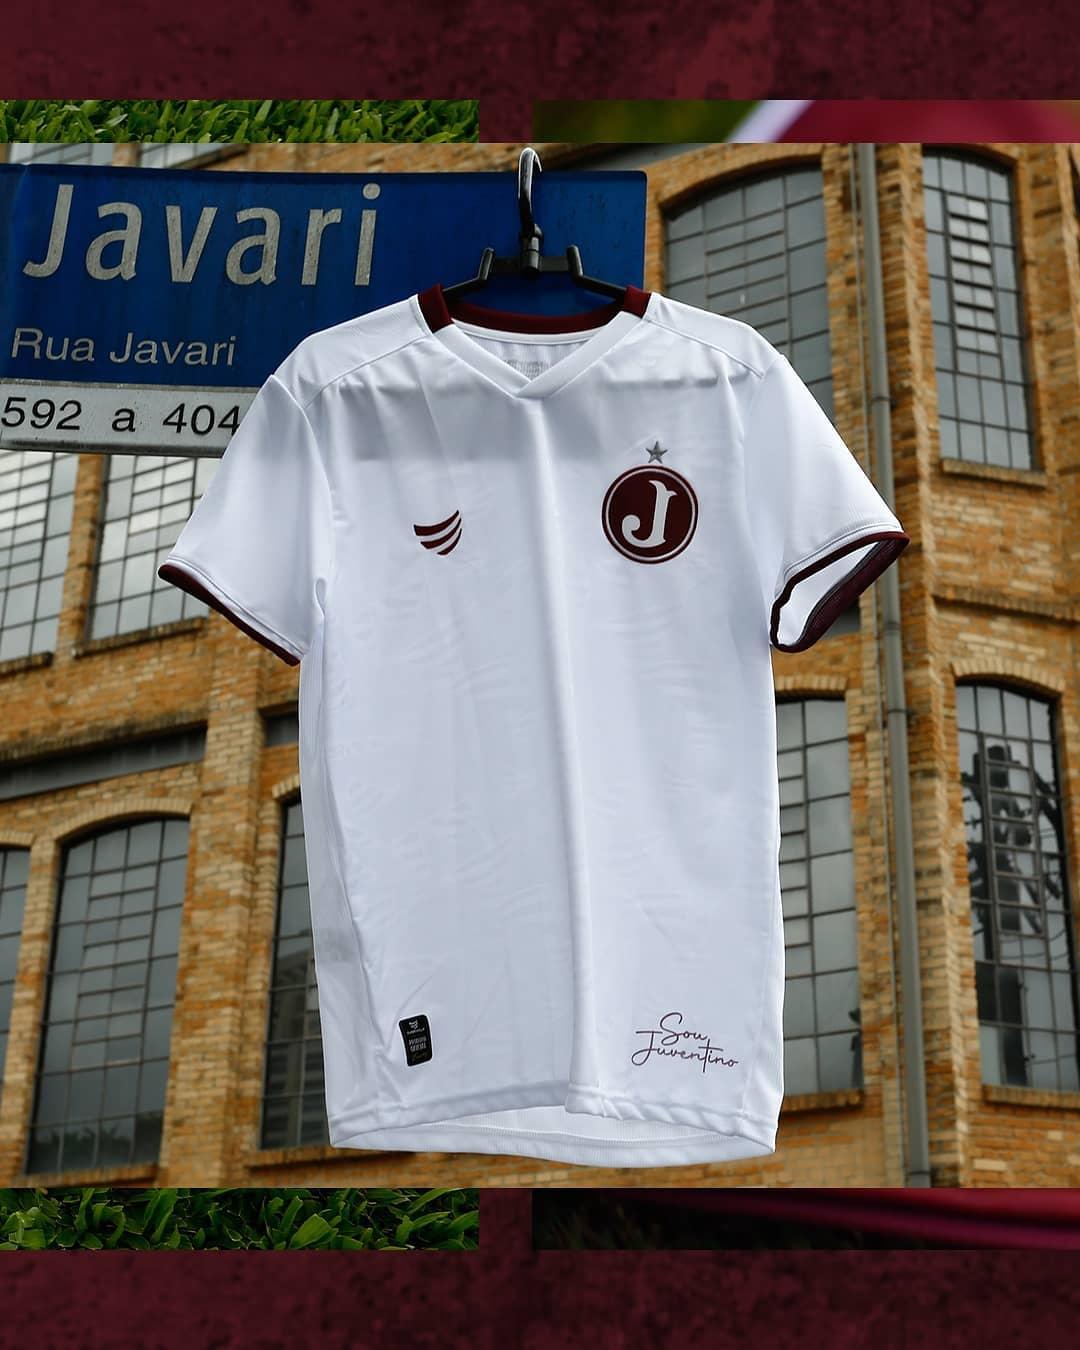 Camisas do Juventus da Mooca 2021 Super Bolla Reserva